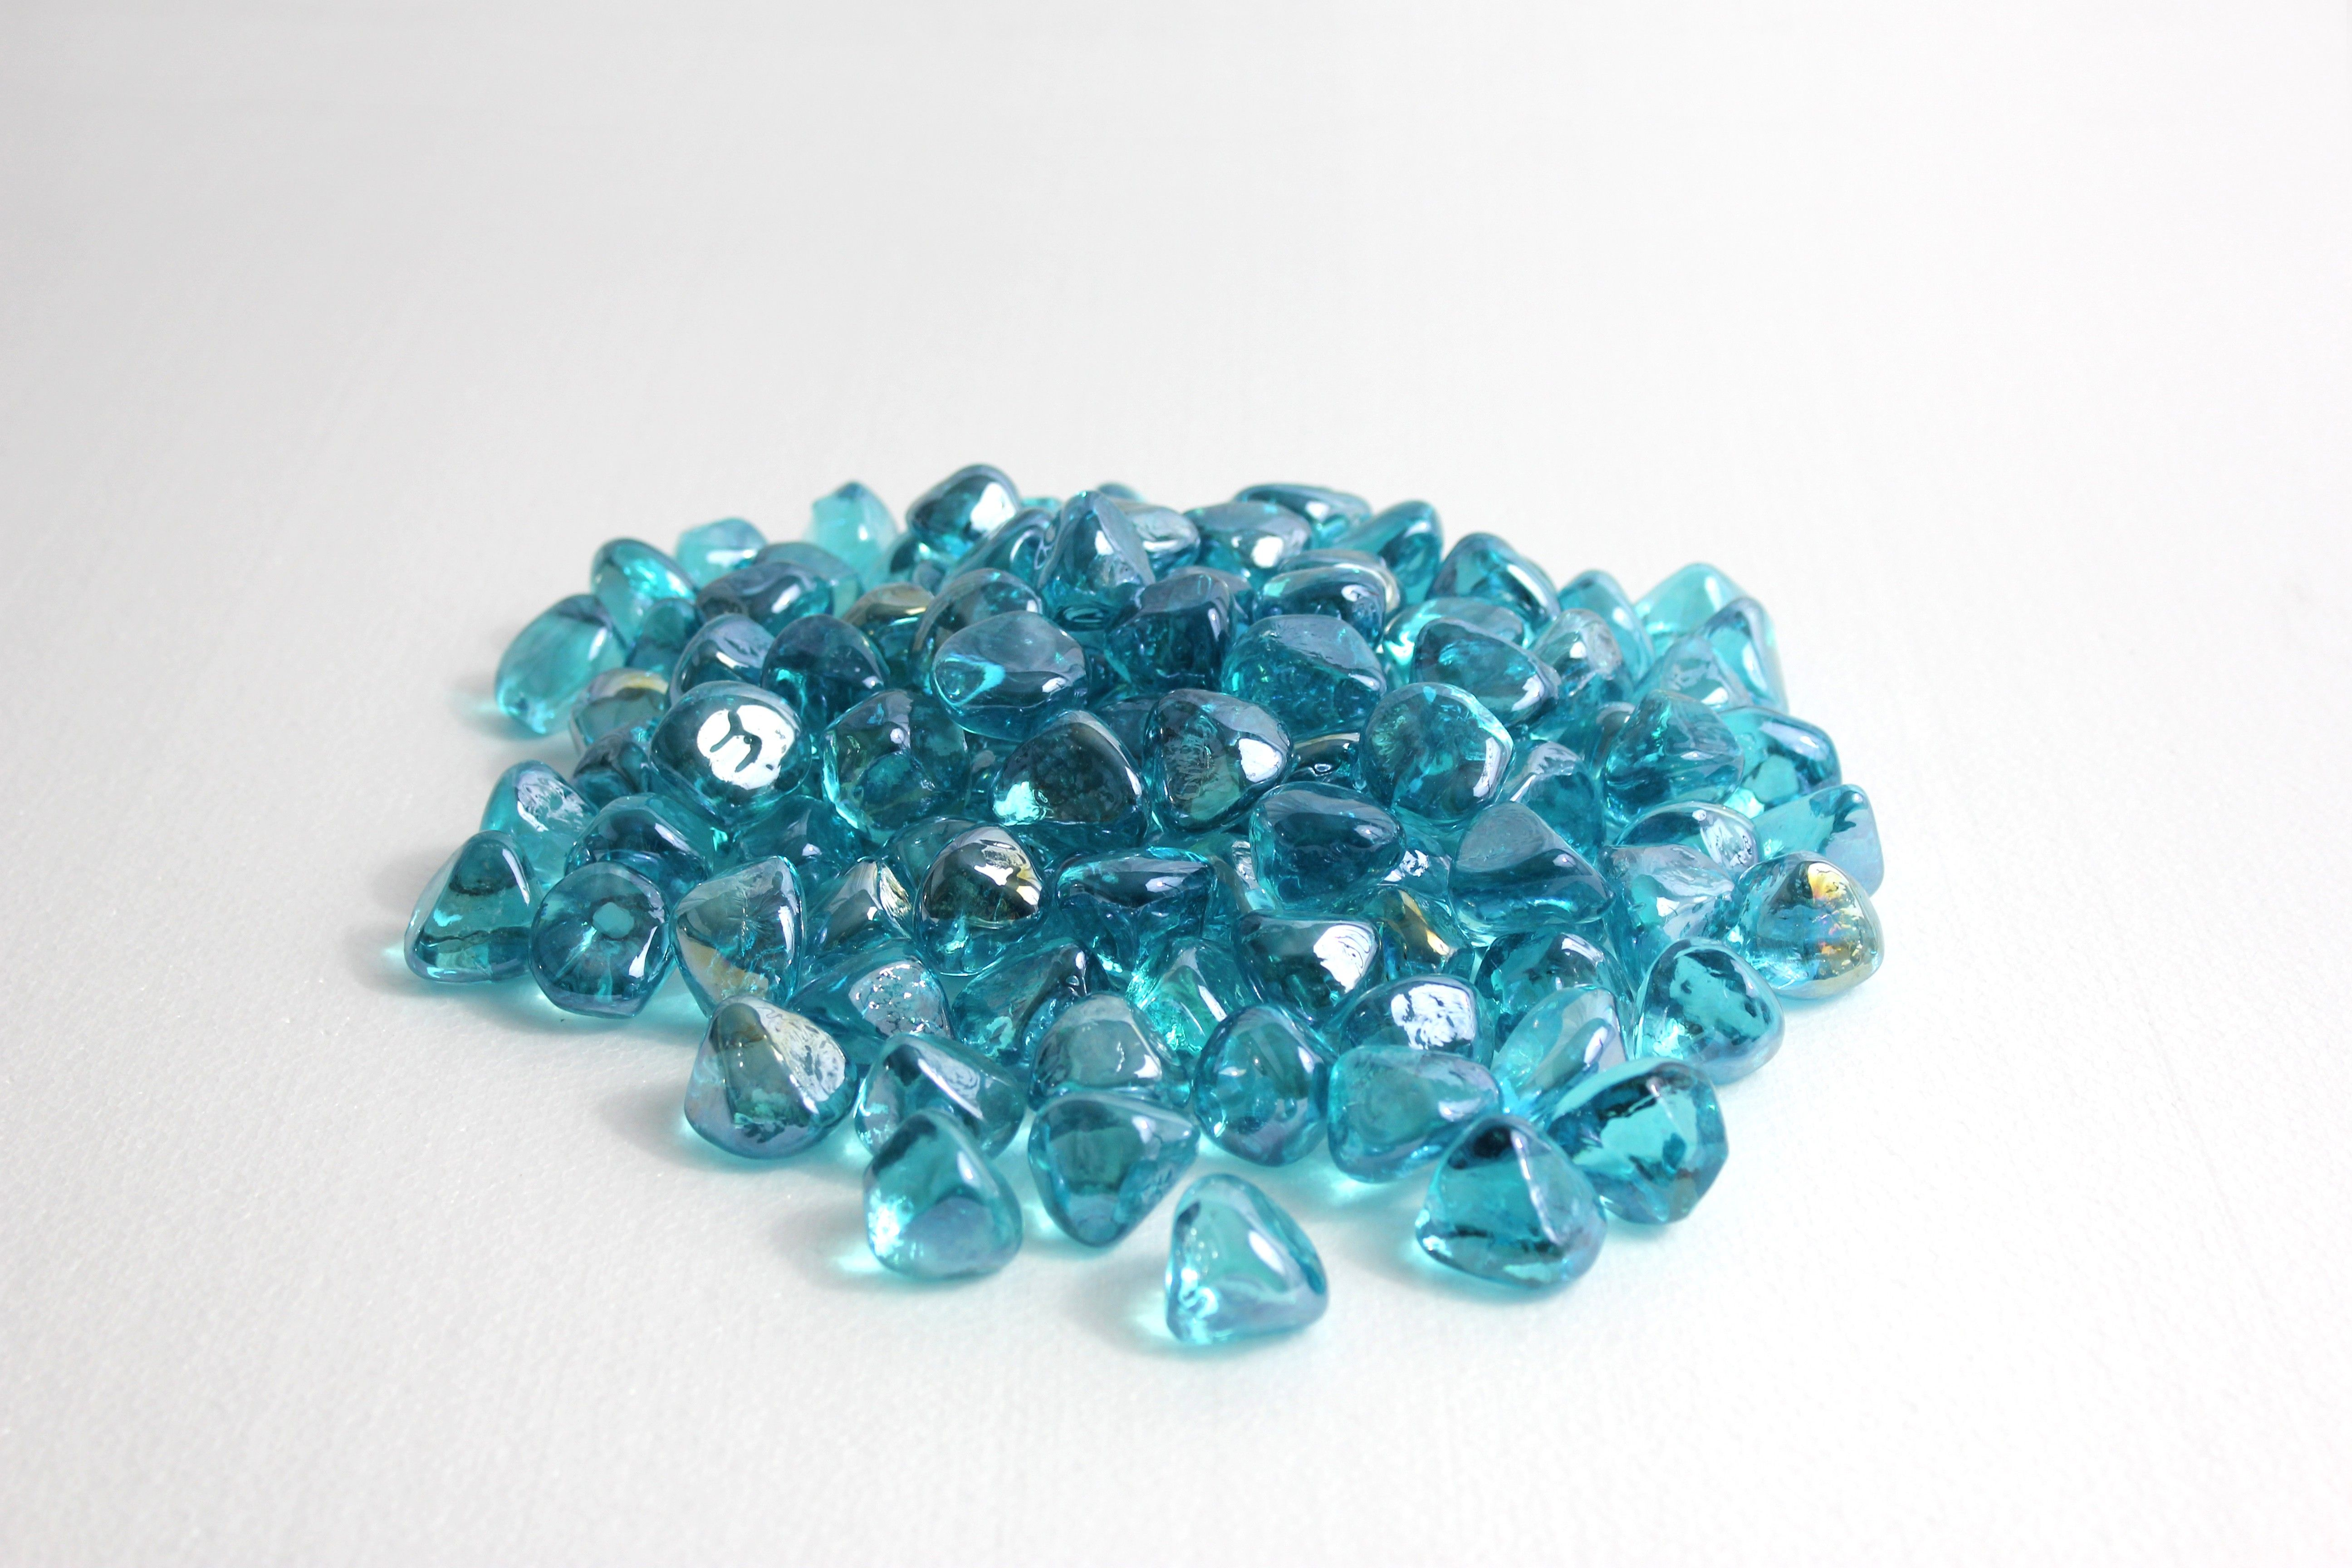 Powder Blue Luster Zircon Fireglass